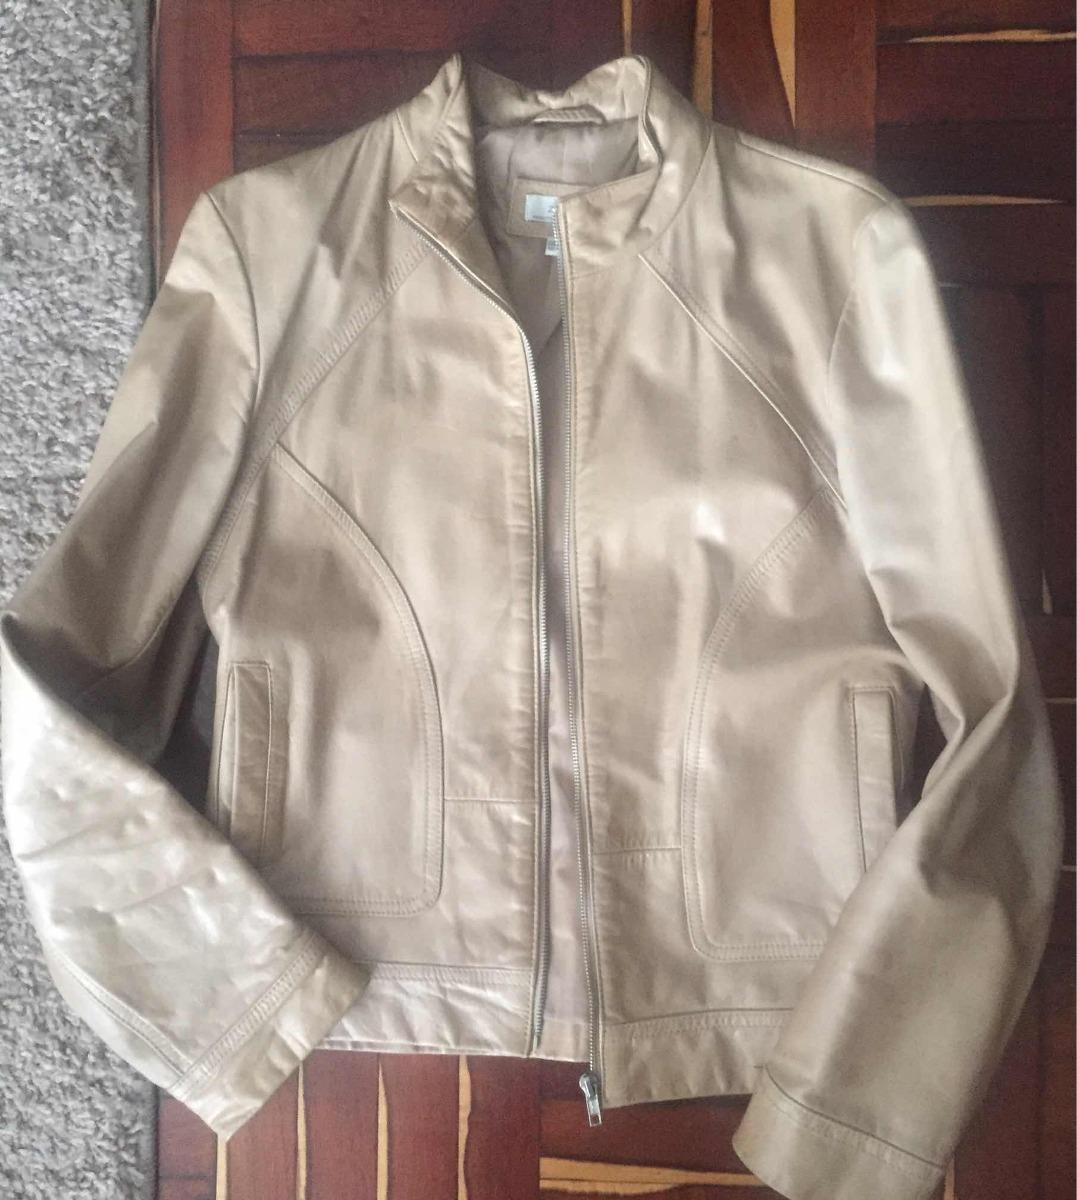 campera-chaqueta-cuero-zara-beige-talle-l-vea-descripcion-D NQ NP 989771-MLU27955785842 082018-F.jpg dea46f9eb21